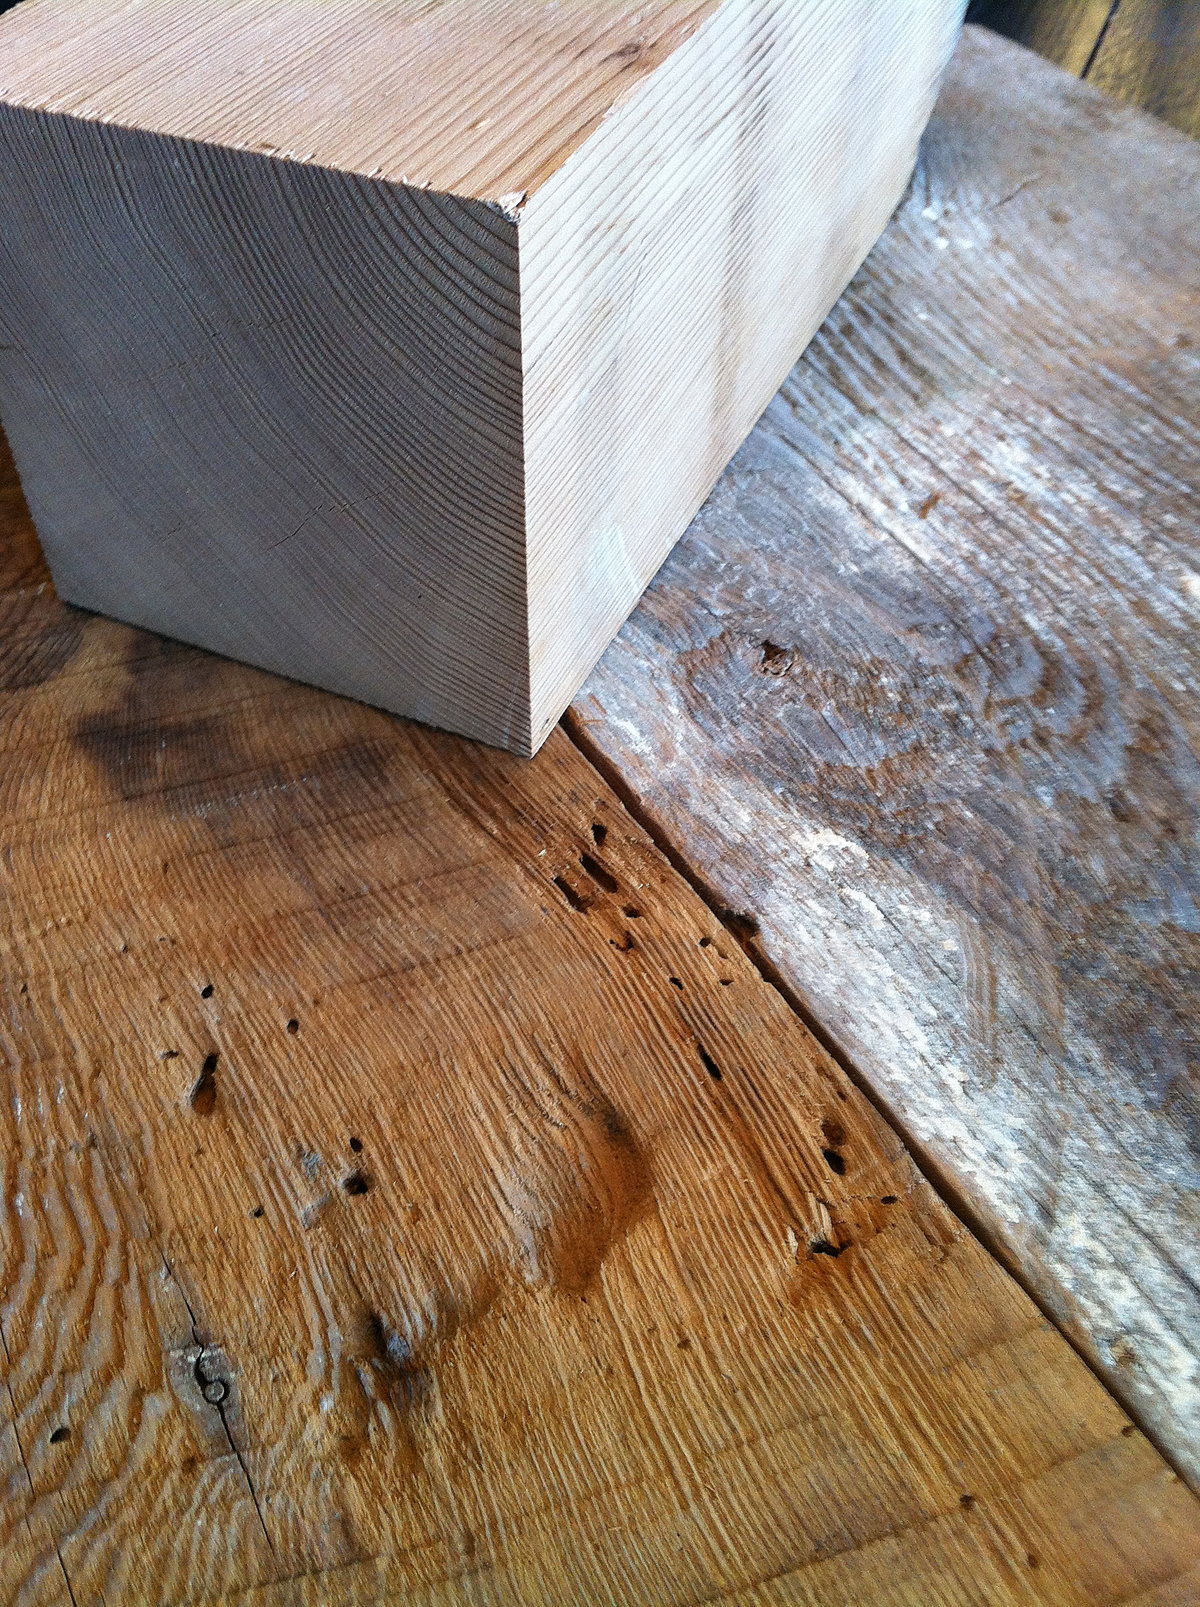 sylvie-hill-reclaimed-wood-table-ottawa